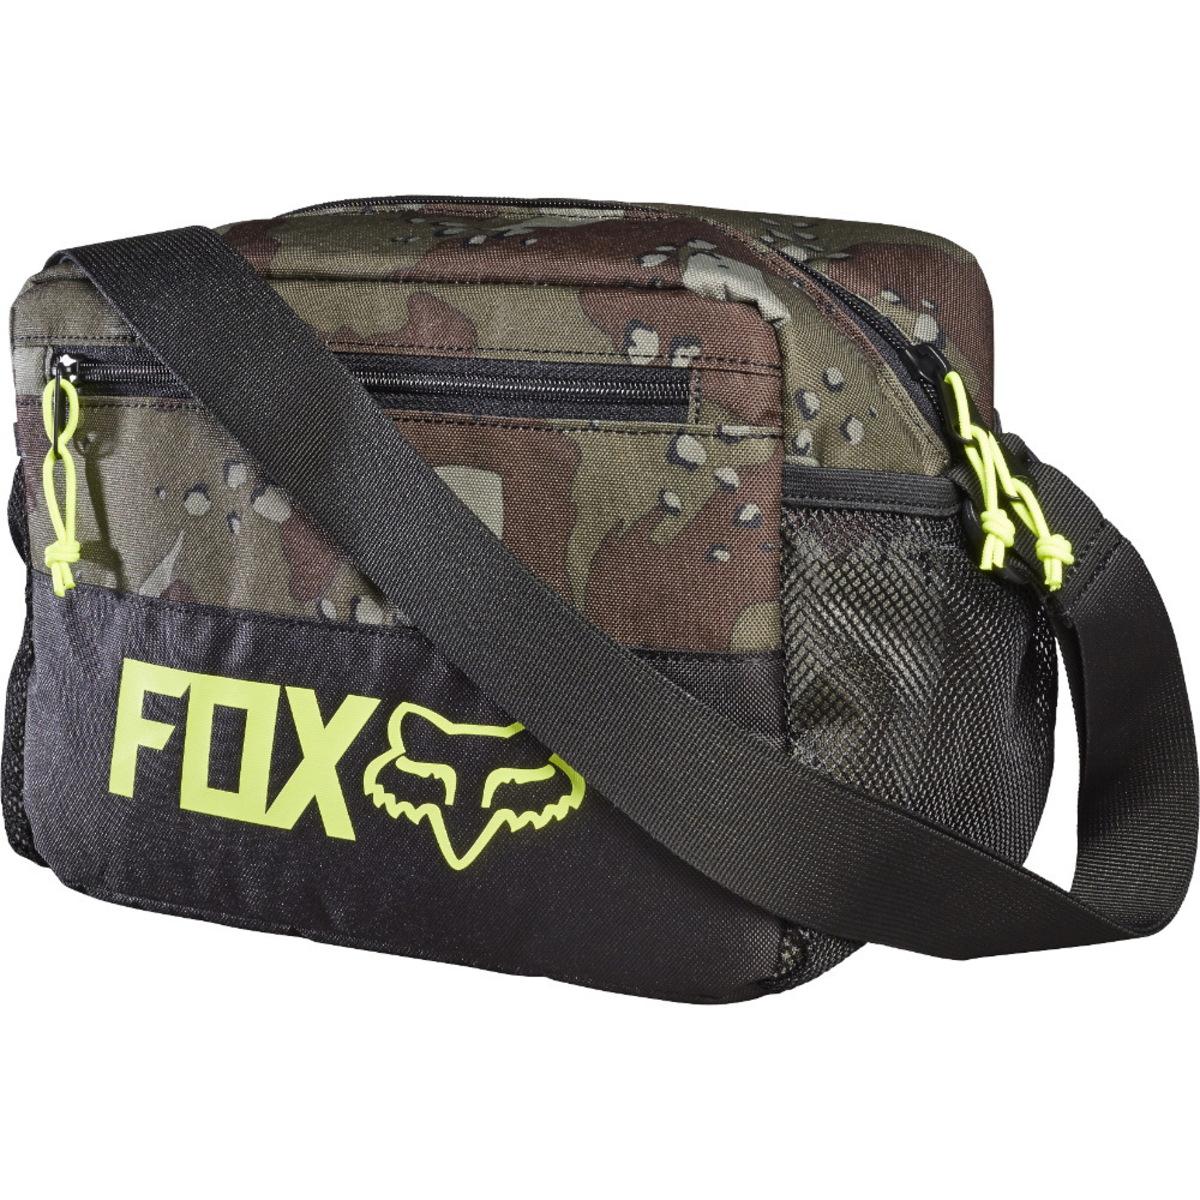 taška FOX - Hazzard Cooler - Black - 16260-001